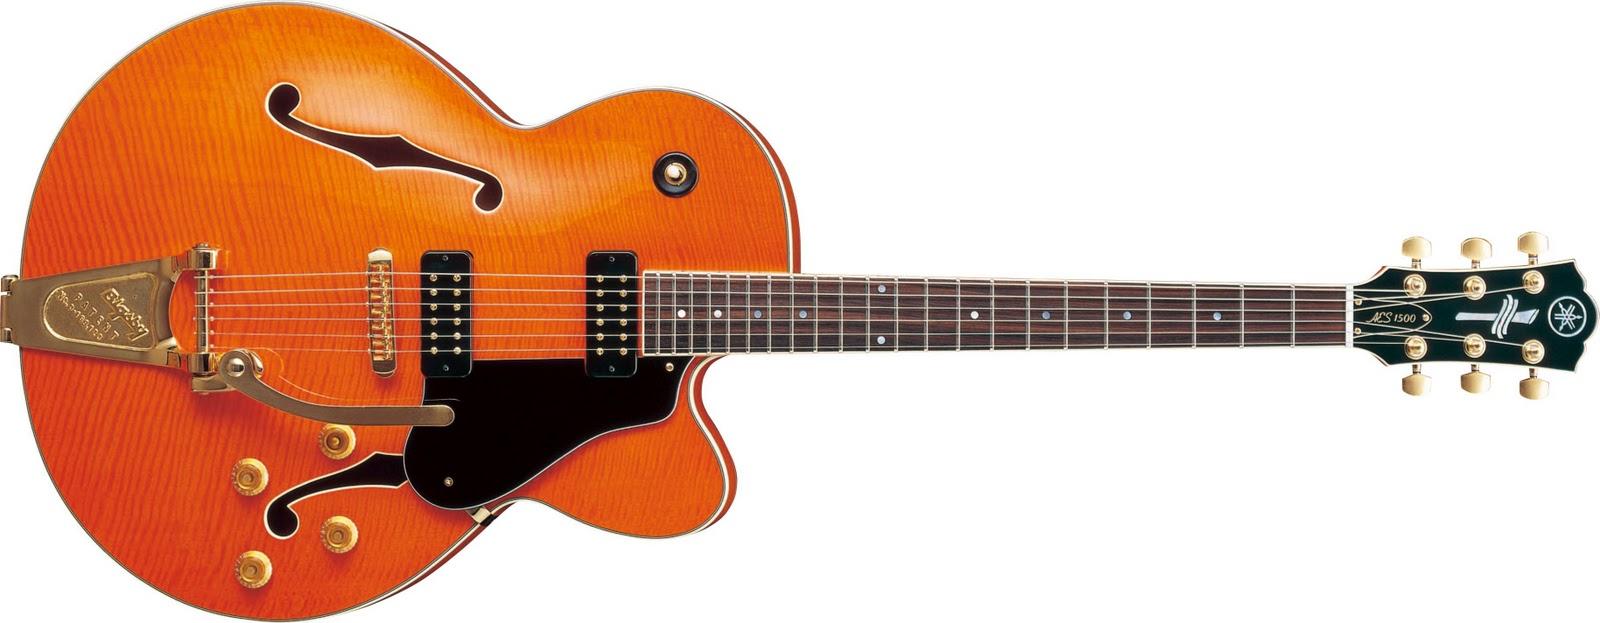 Brand new guitars price yamaha for Yamaha guitar brands